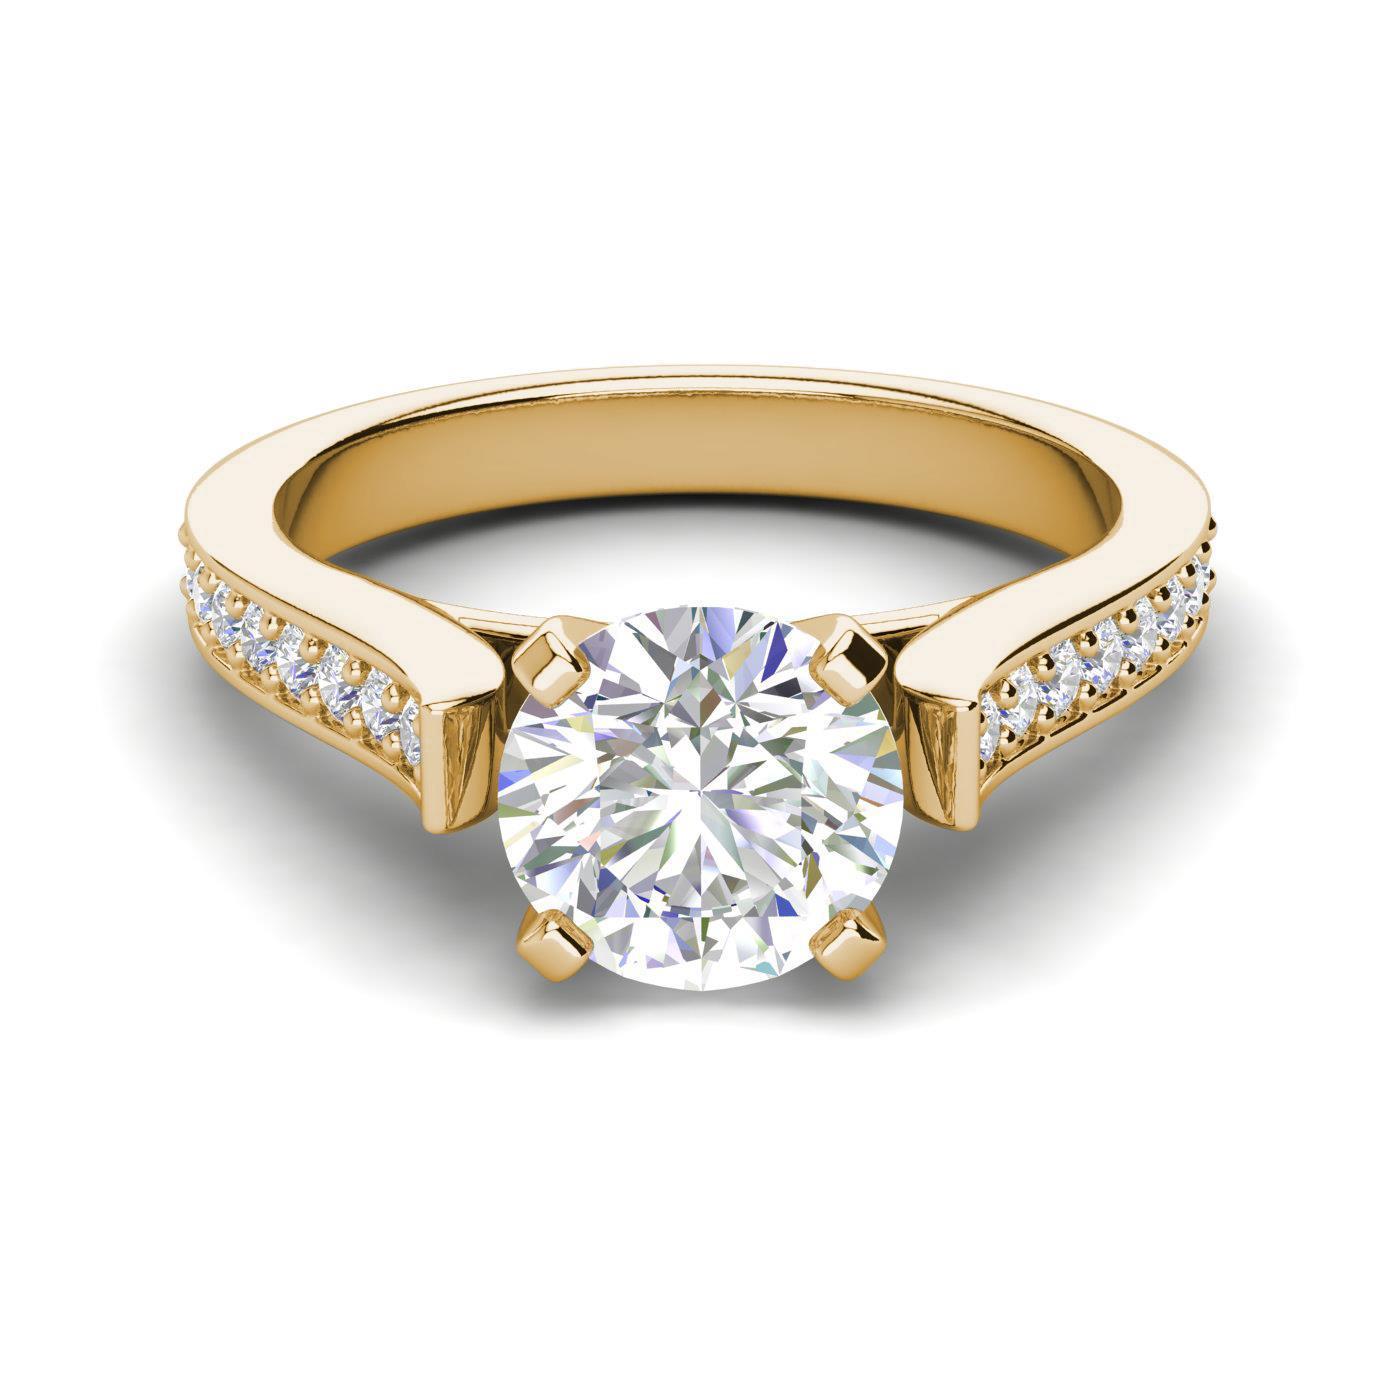 Margaret of Scotland Pendant DiamondJewelryNY 14kt Gold Filled St